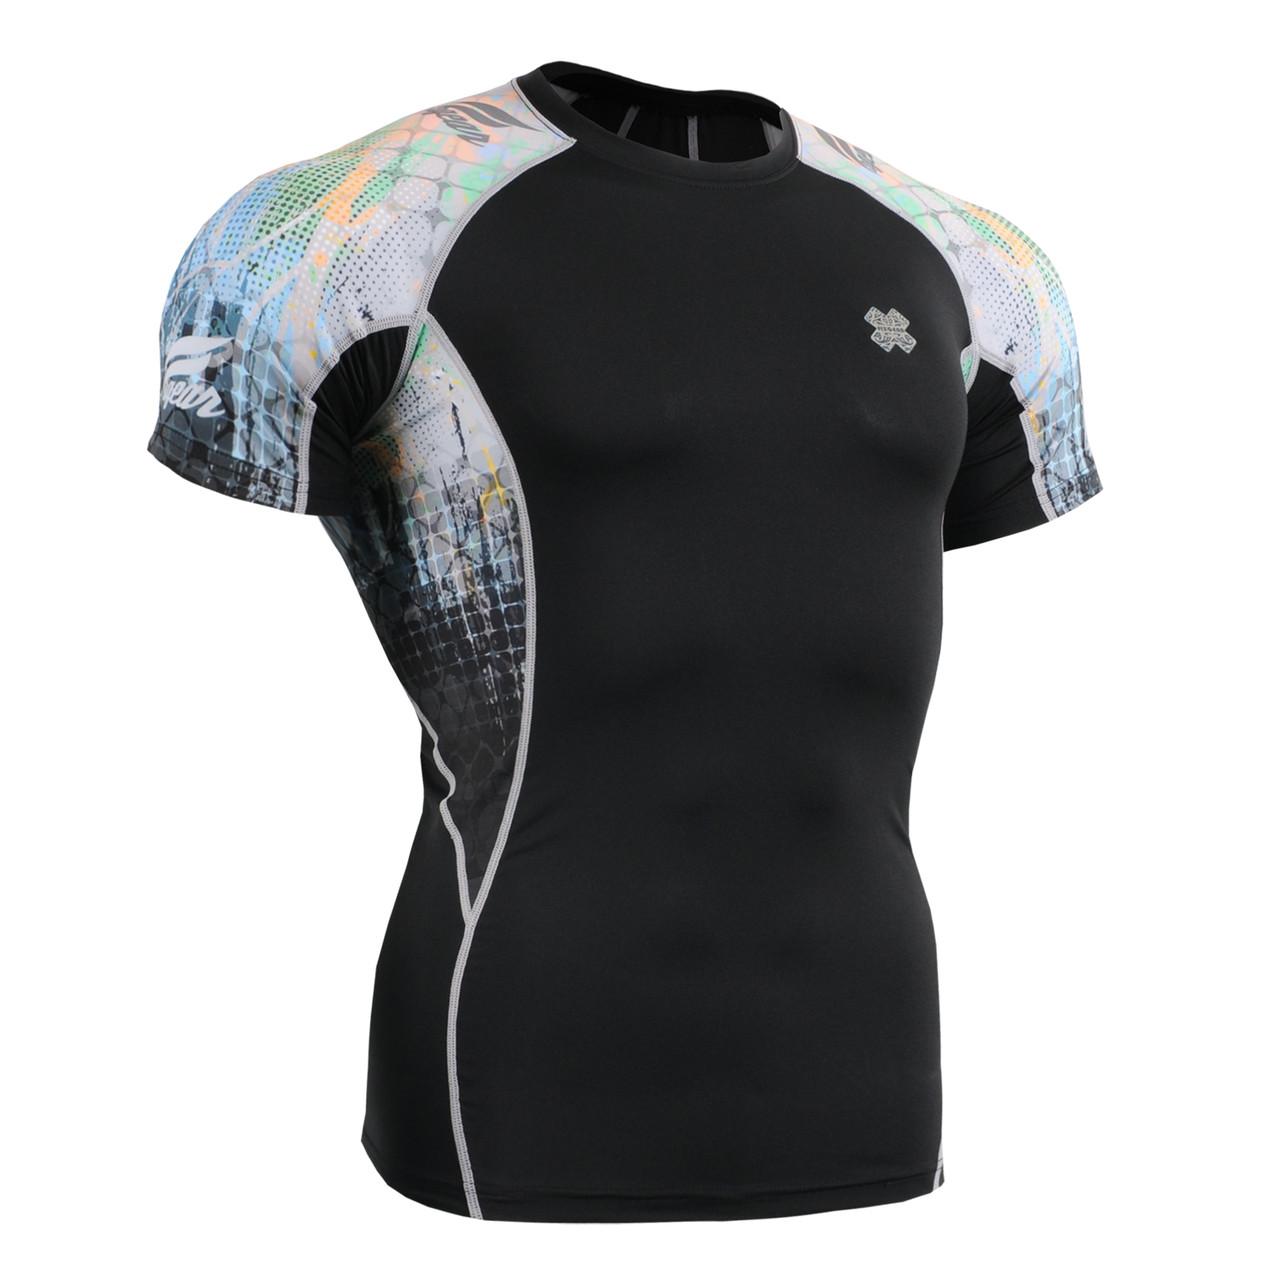 Компресійна футболка рашгард Fixgear C2S-B42